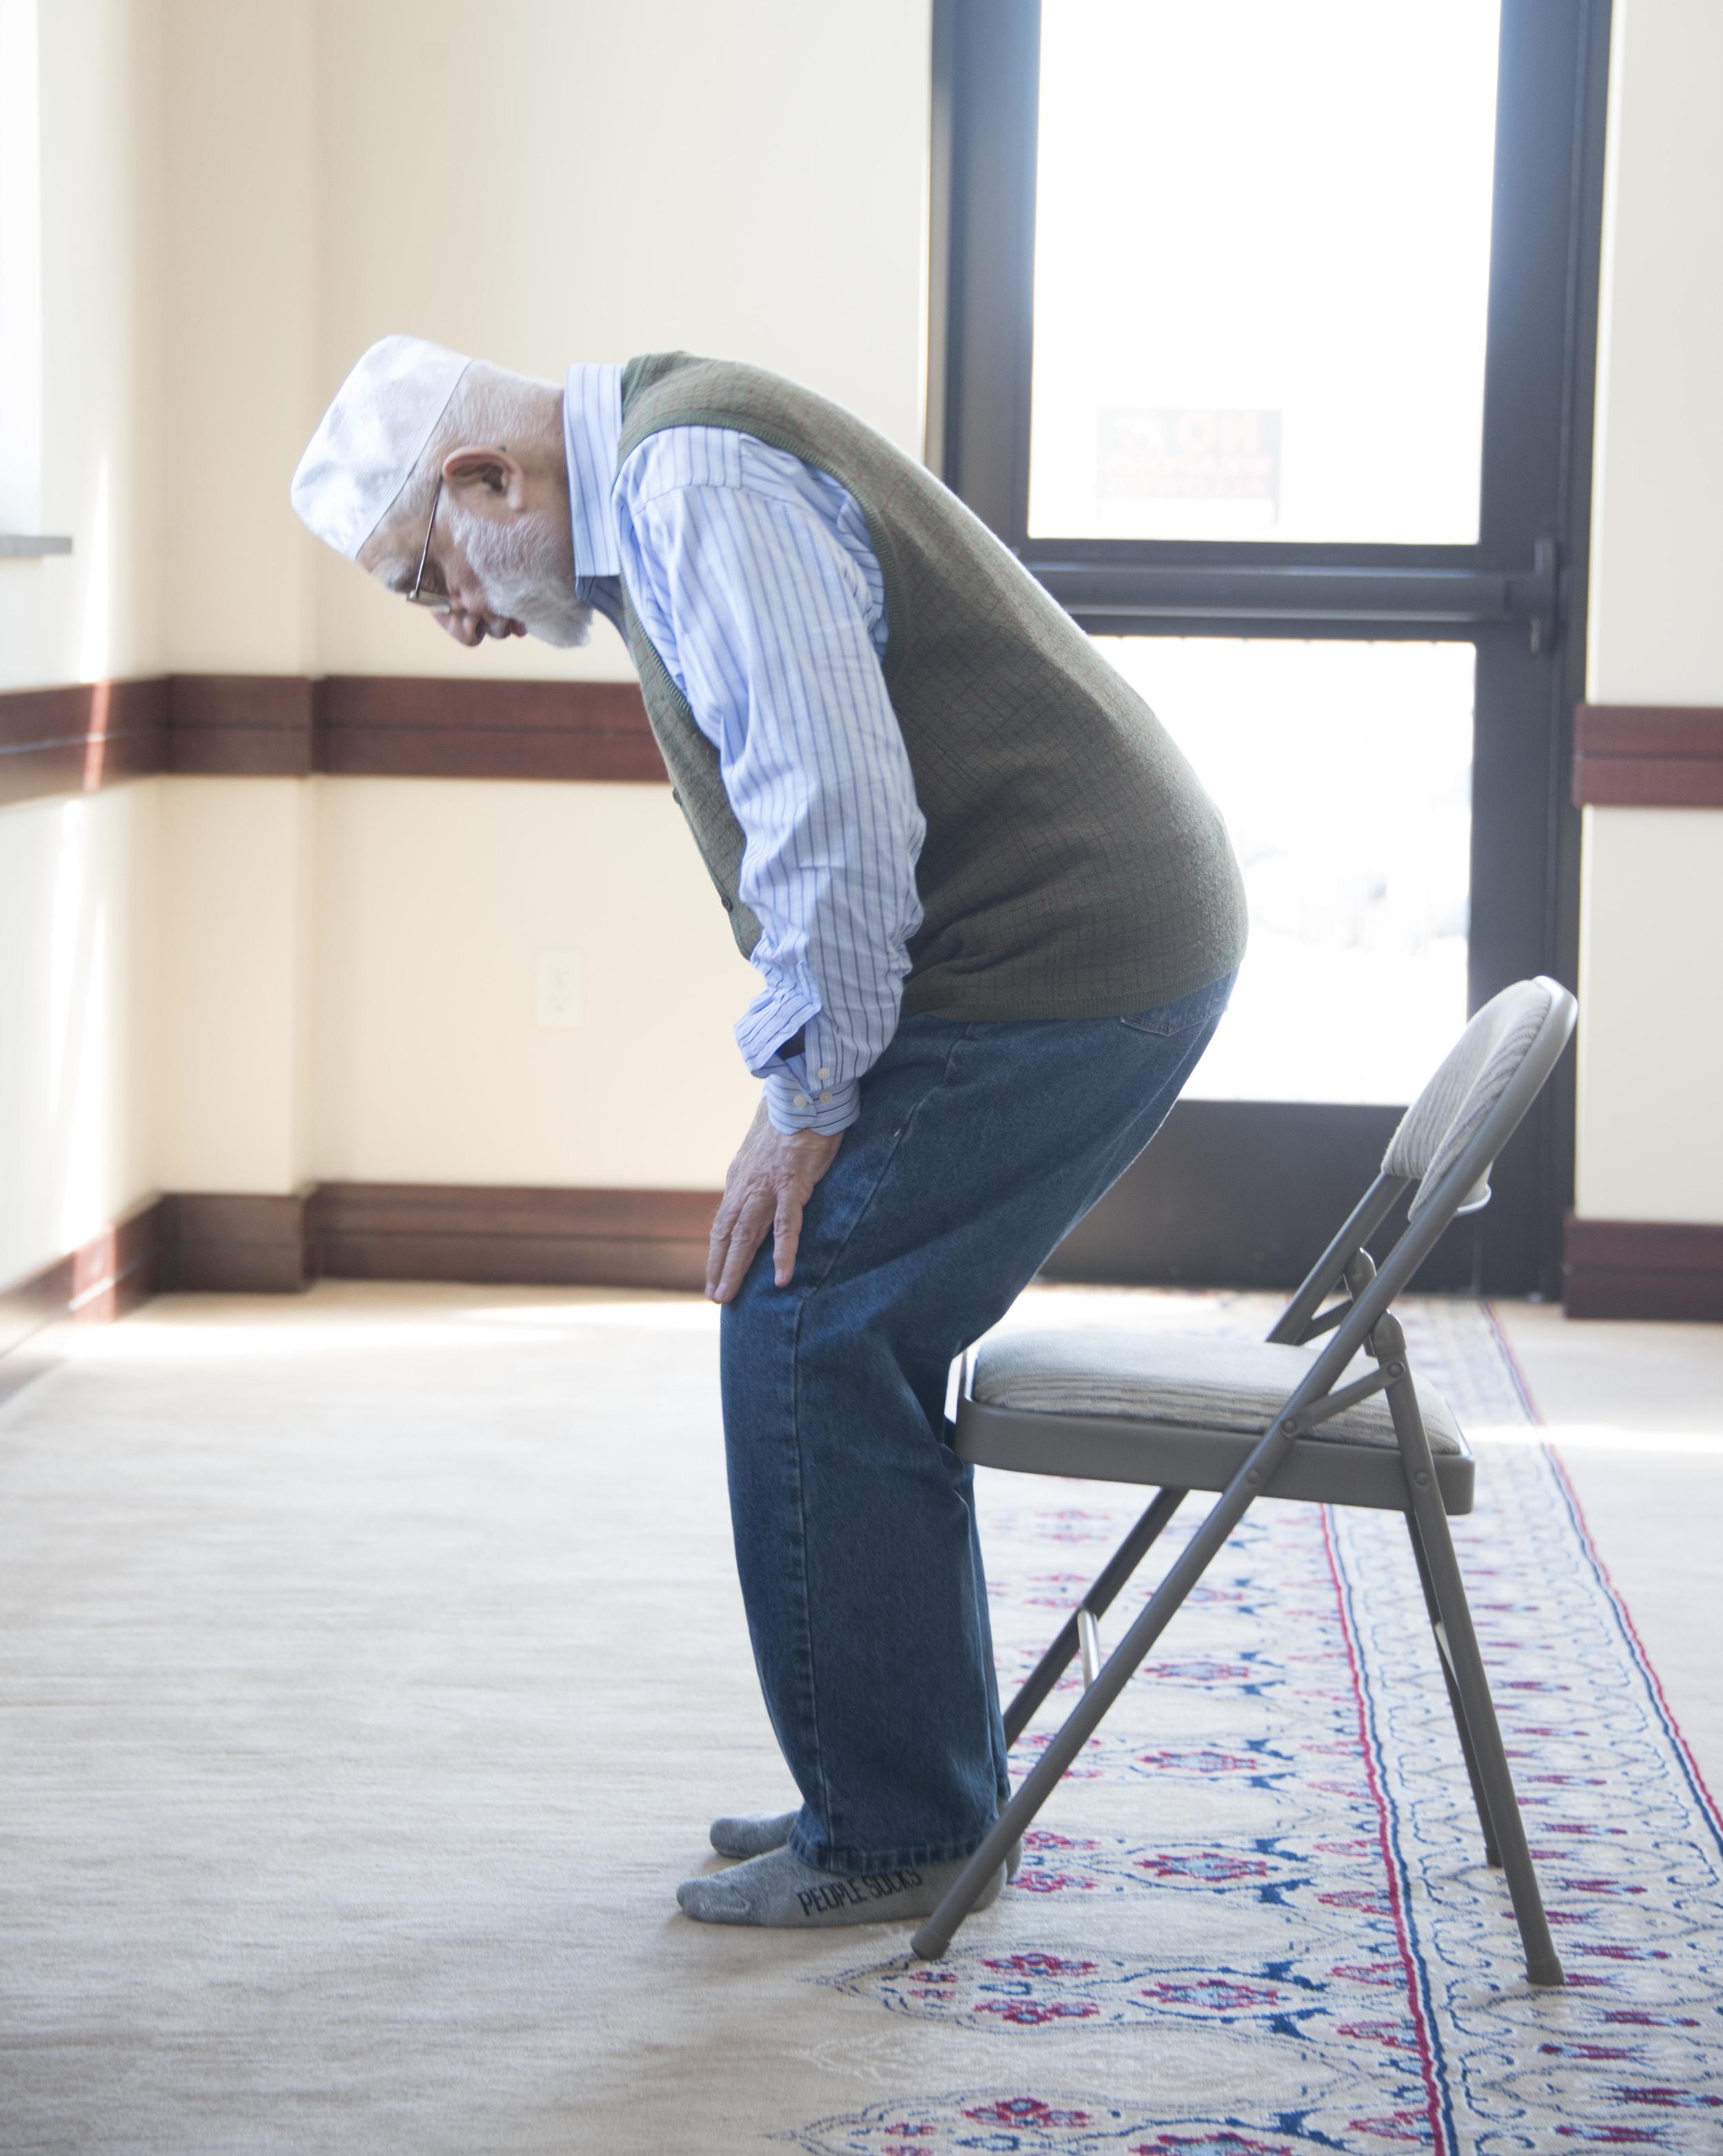 An elderly gentleman offers Namaz